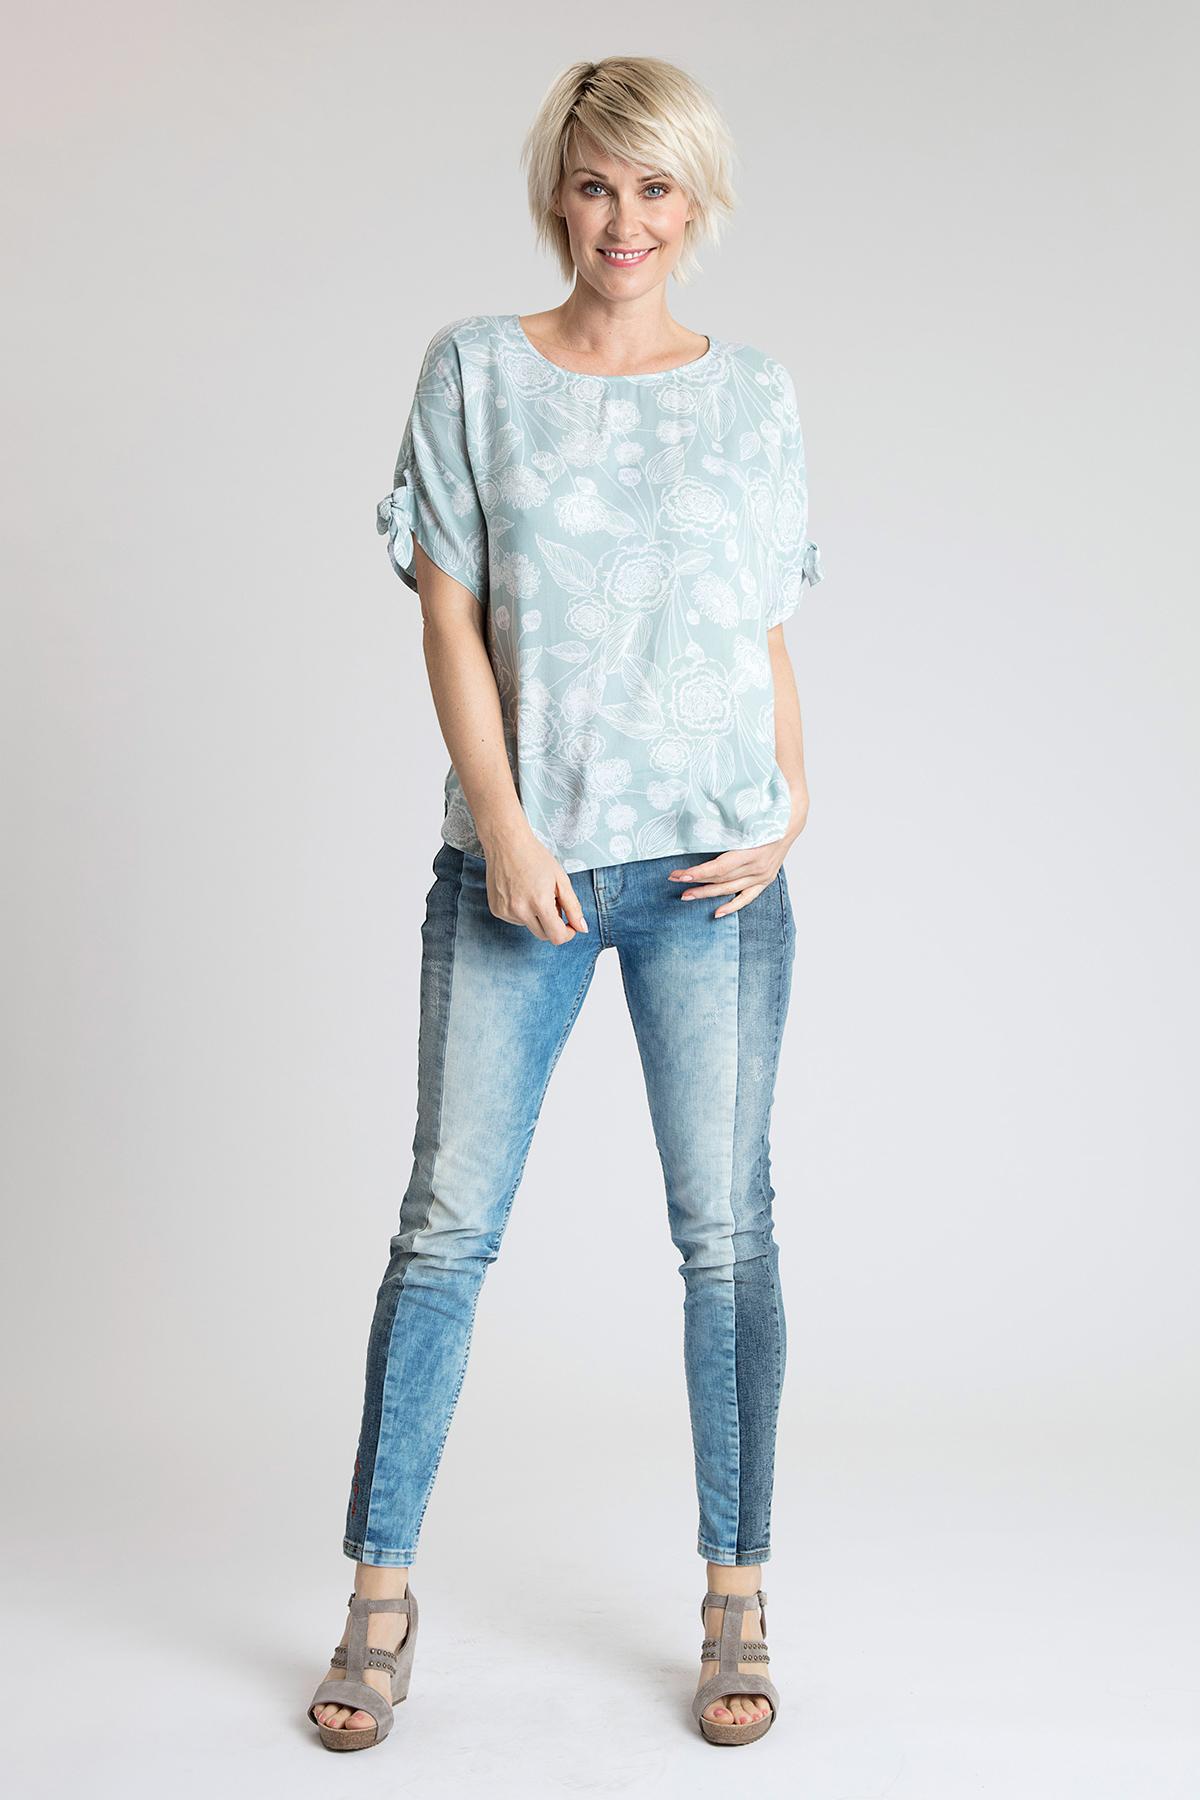 Opaalgroen/off-white